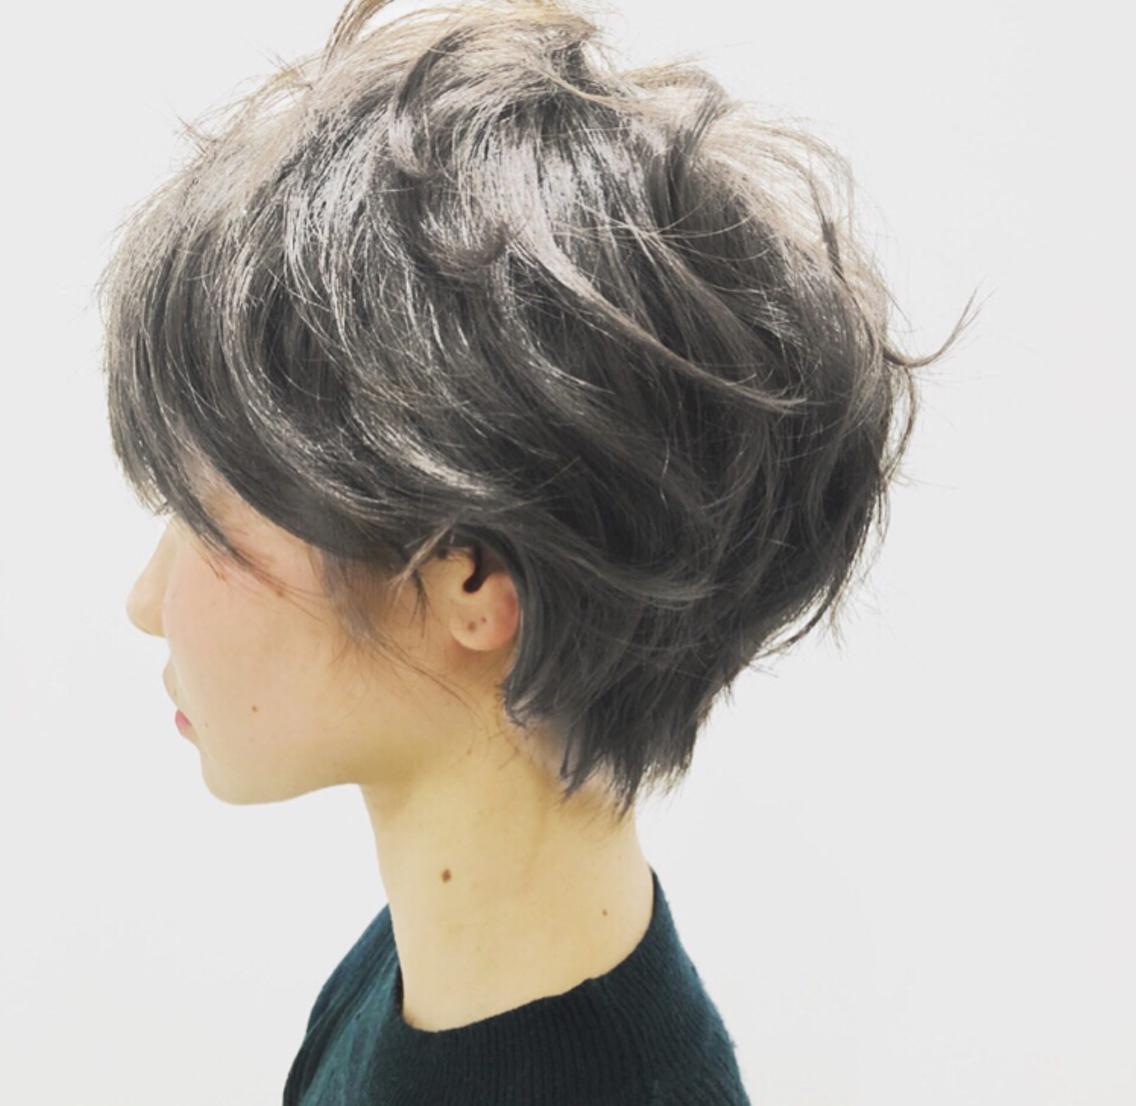 NYNY.co なんばパークス店所属・上田篤史の掲載